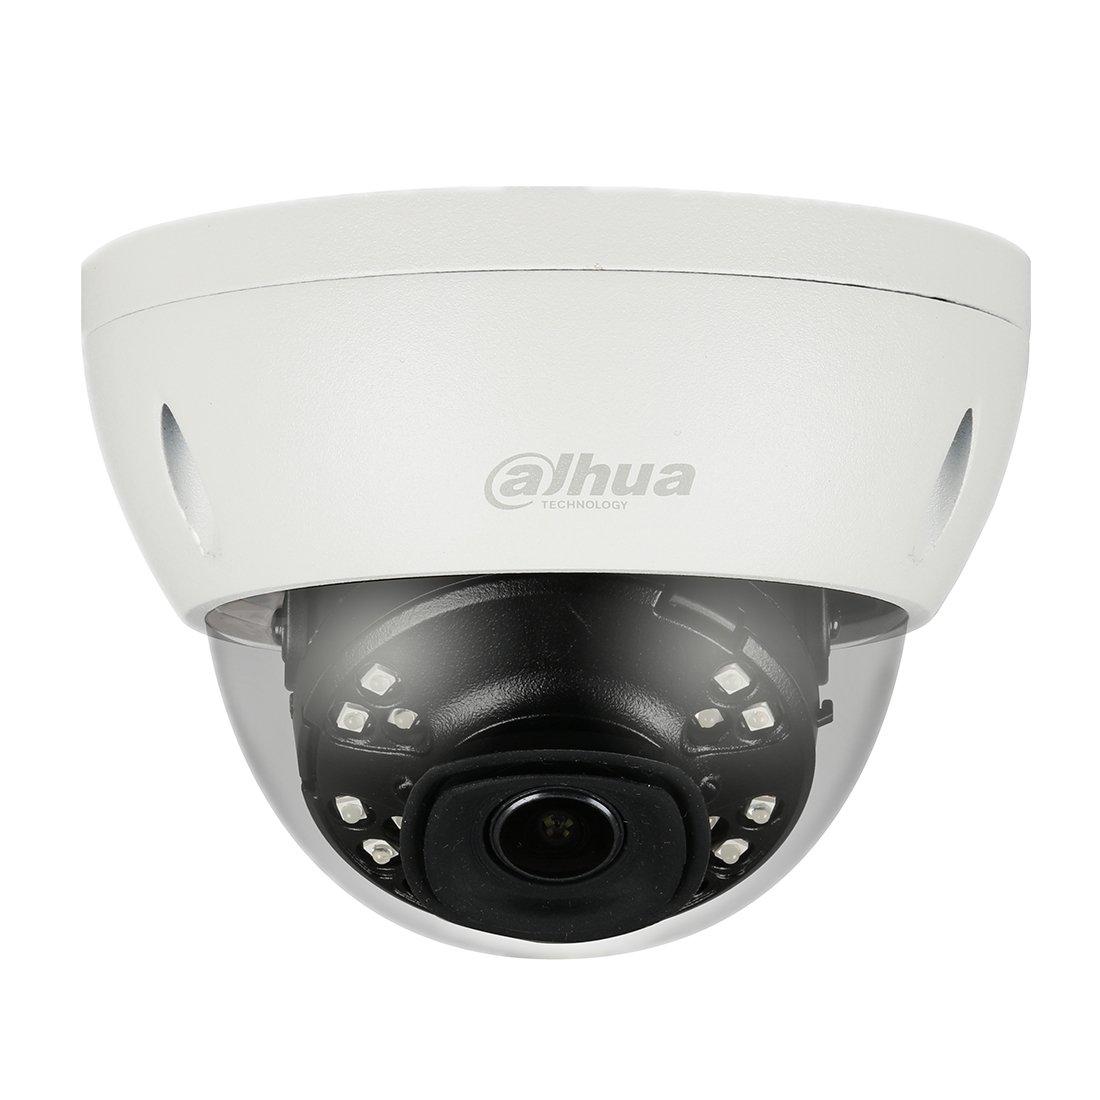 Dahua UltraHD 4K (8MP) Outdoor Security PoE+ IP Camera IPC-HDBW4831E-ASE,3840×2160 Resolution Surveillance Camera 2.8mm Fixed Lens with Audio,Alarm,SD Card Slot,30m Night Vision,H.265,IP67,ONVIF